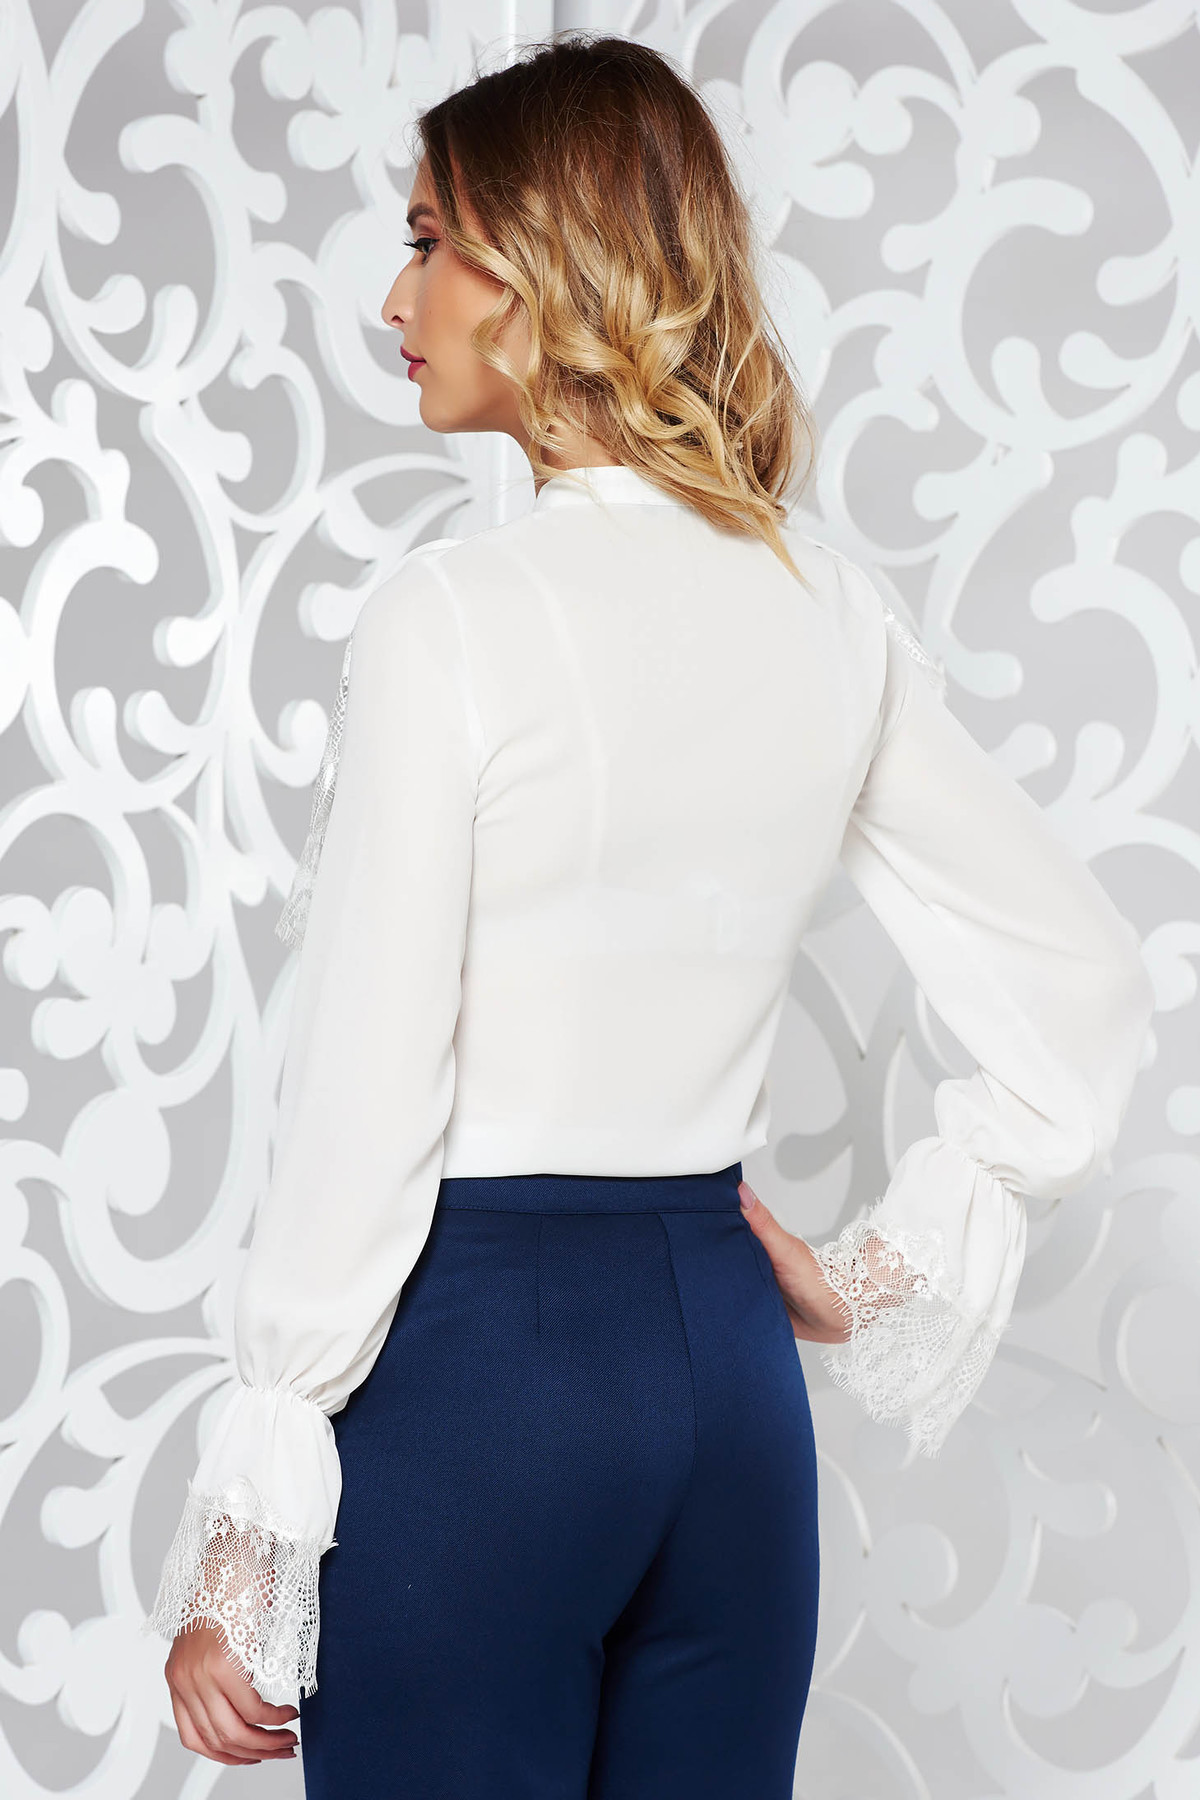 Camasa dama alba eleganta cu croi larg material subtire usor transparent cu volanase din dantela